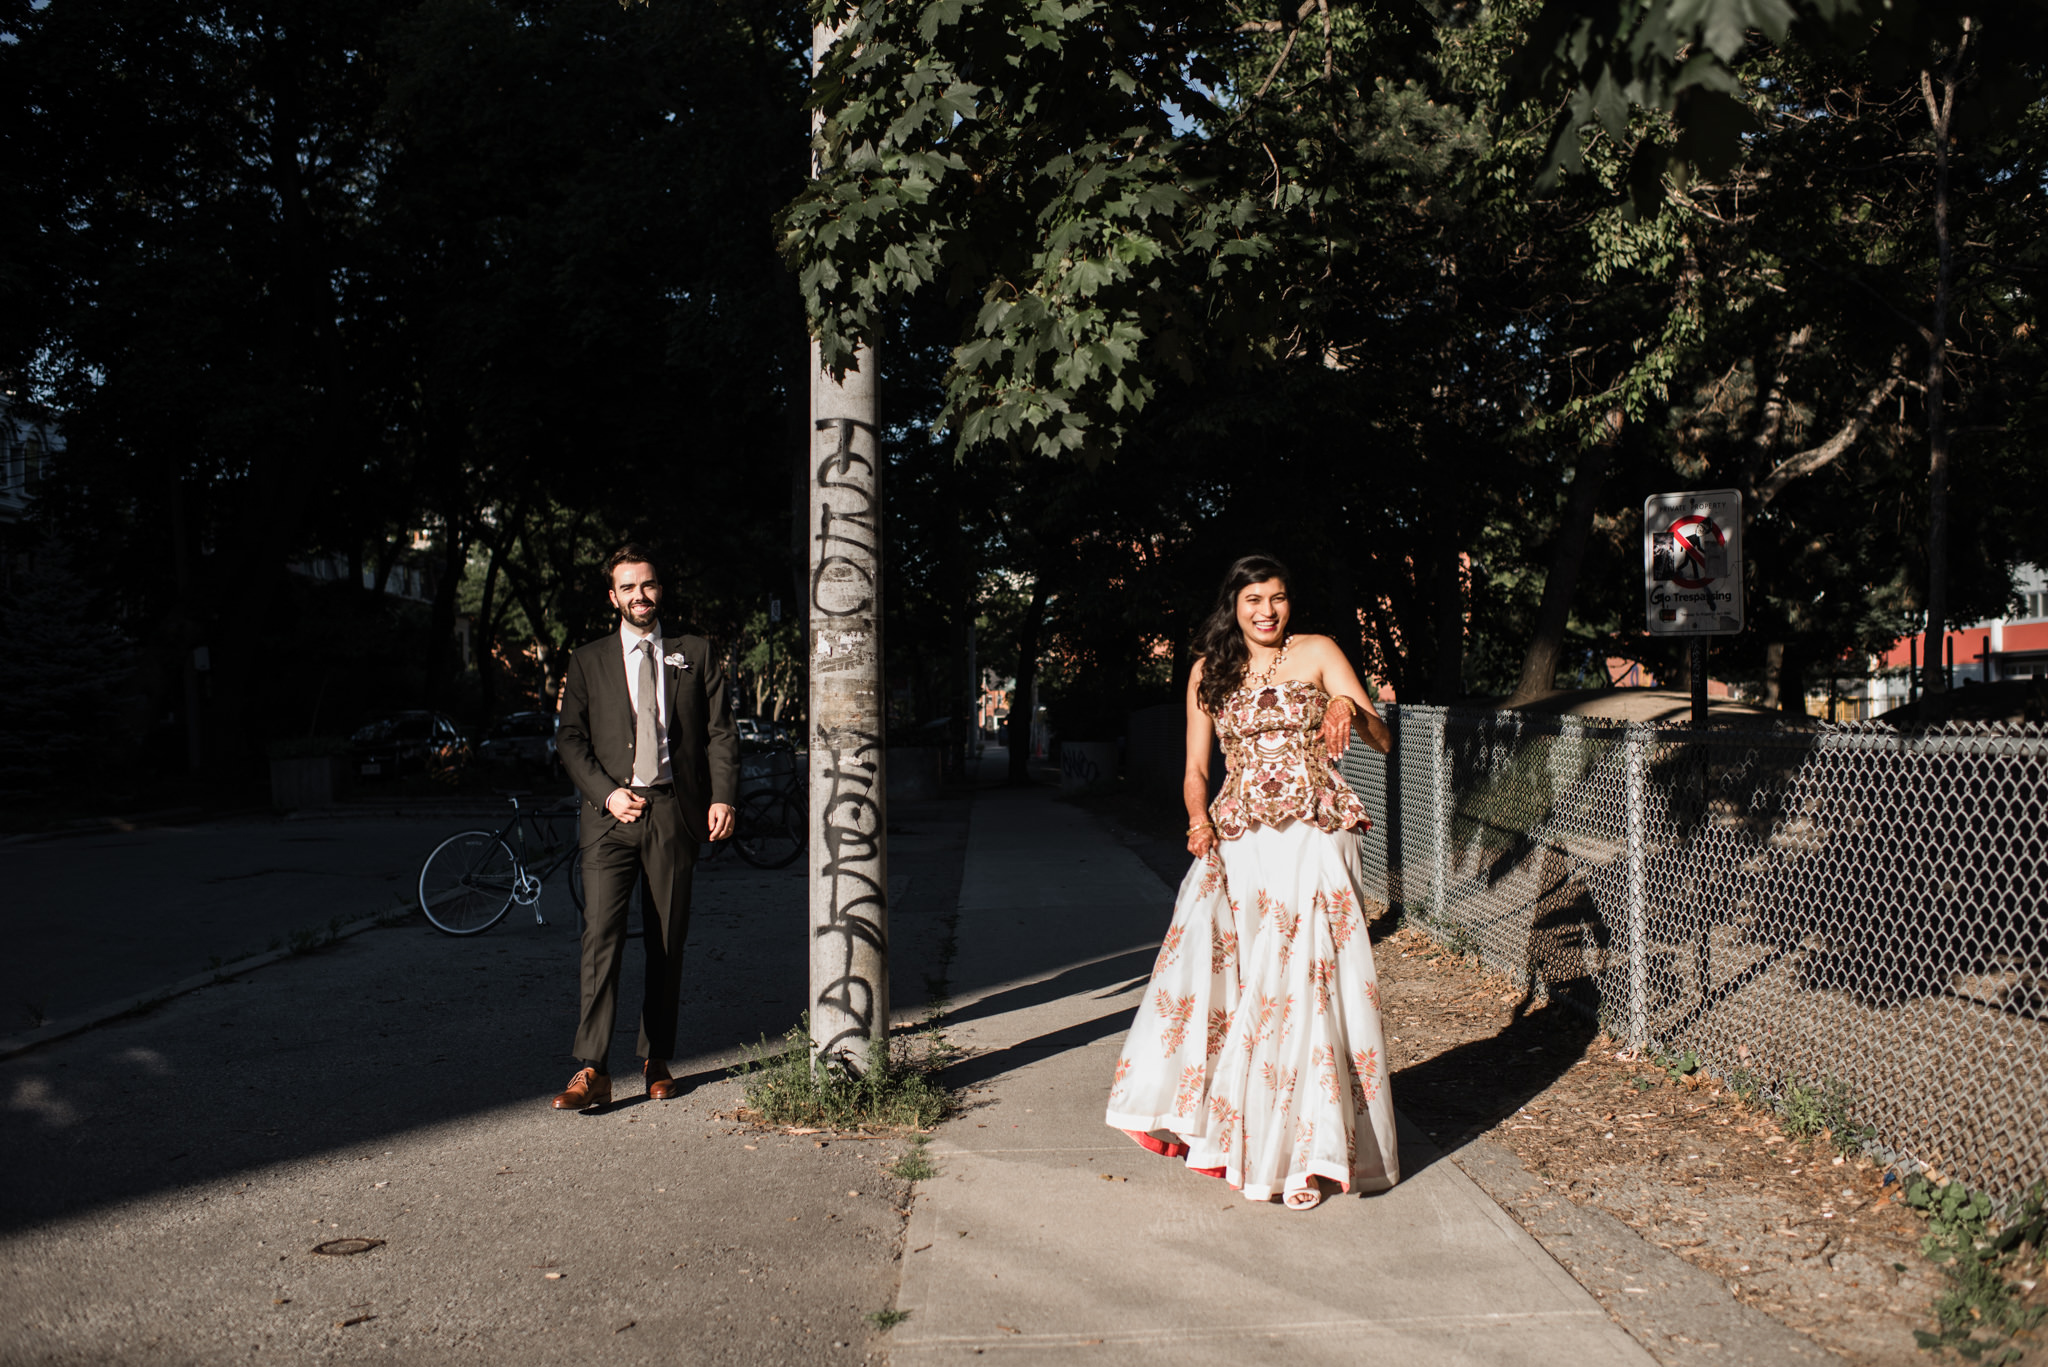 064-bride-groom-couple-wedding-photos-downtown-toronto-hotel-ocho.jpg